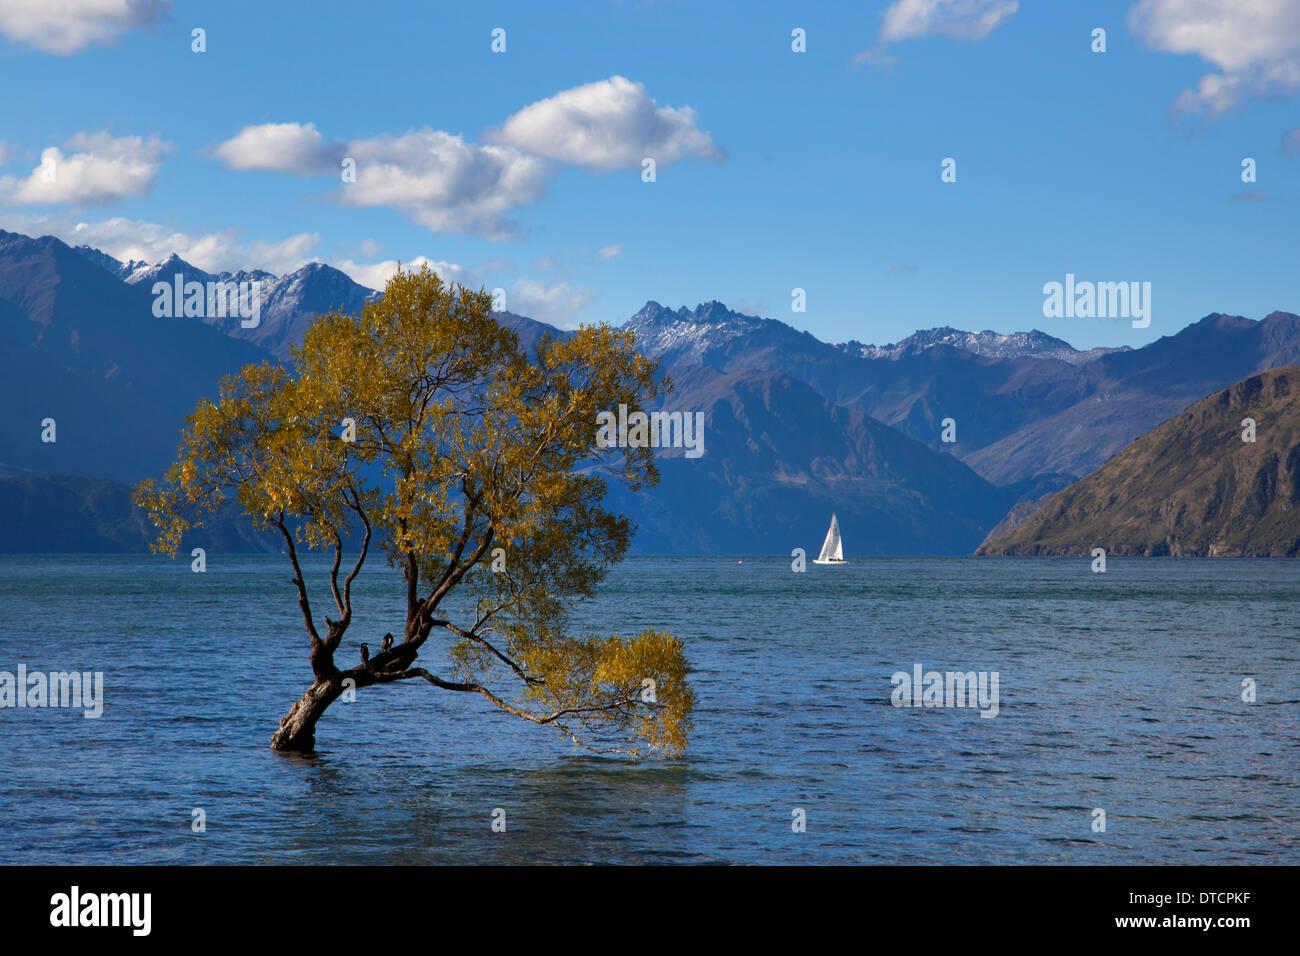 Sailing boats on Lake Wanaka, Wanaka, South Island, New Zealand - Stock Image